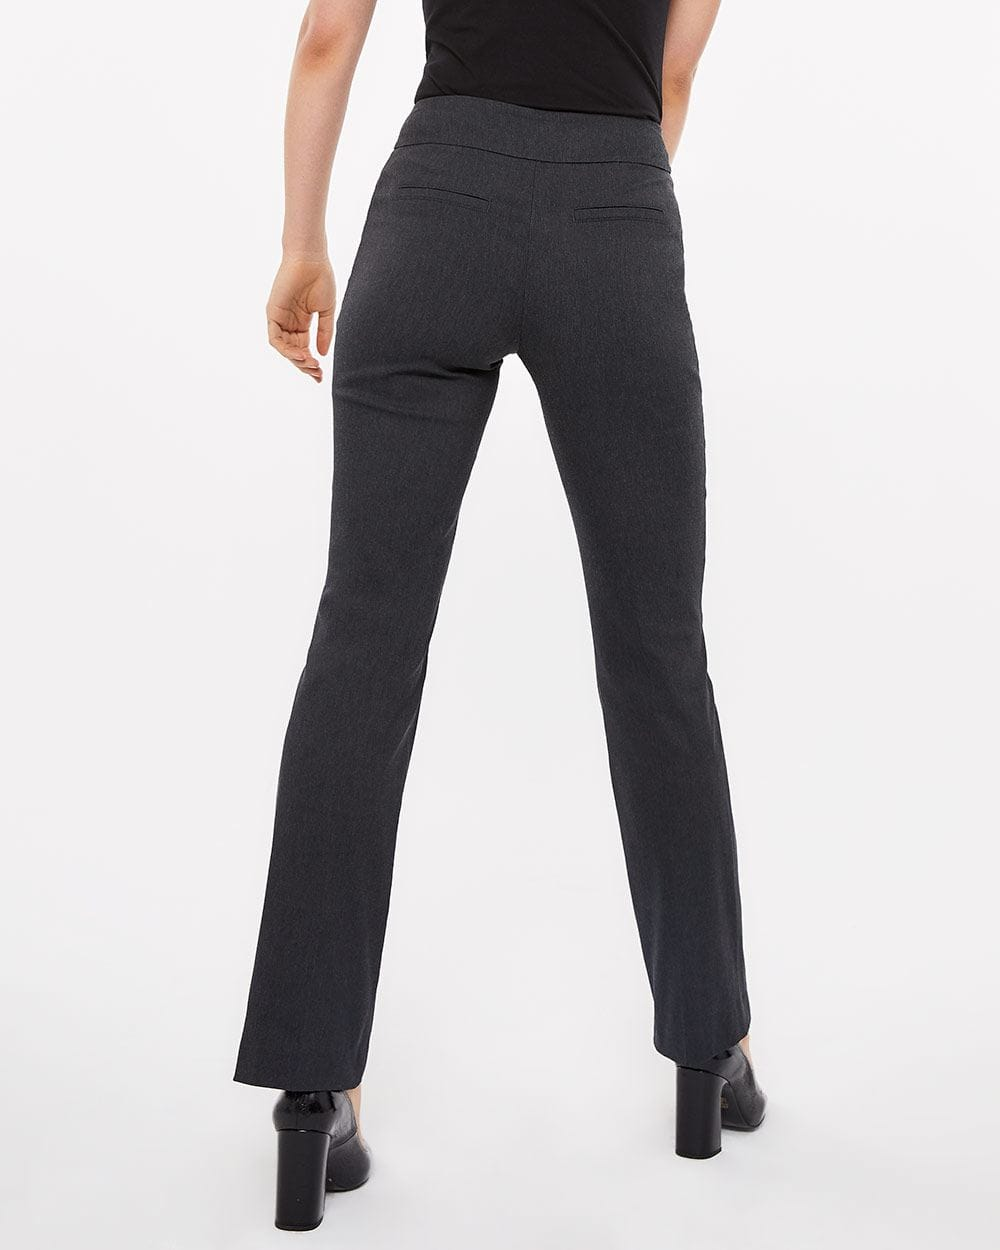 The Tall Iconic Boot Leg Grey Melange Pants